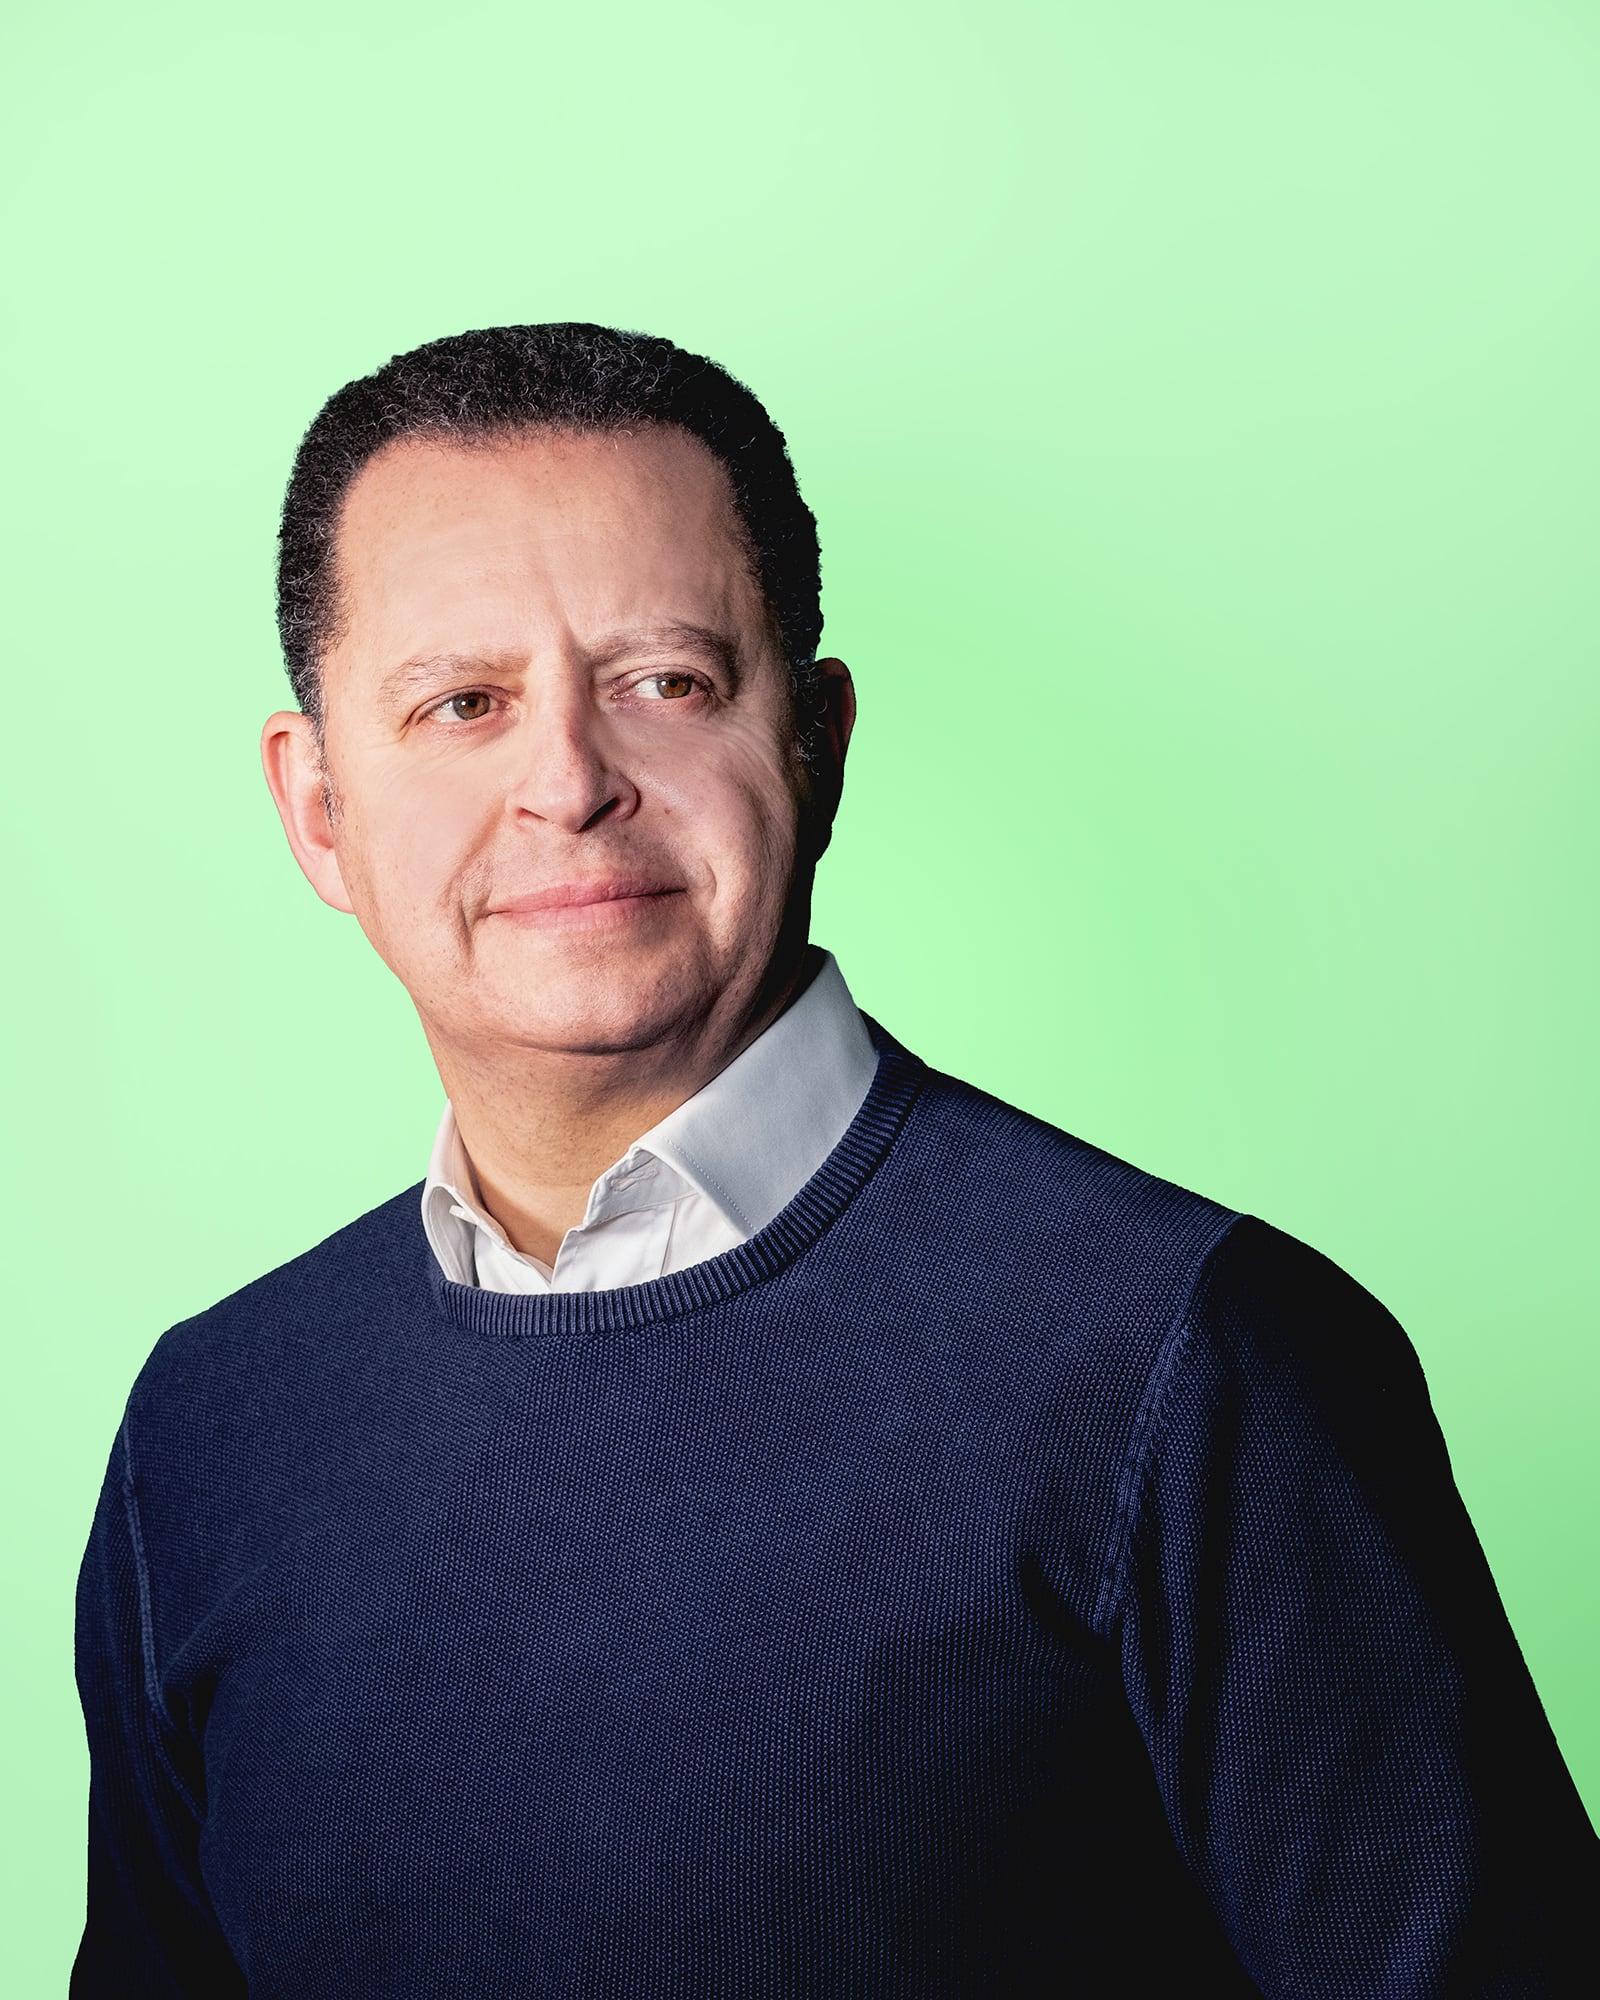 Alessandro Bisignano